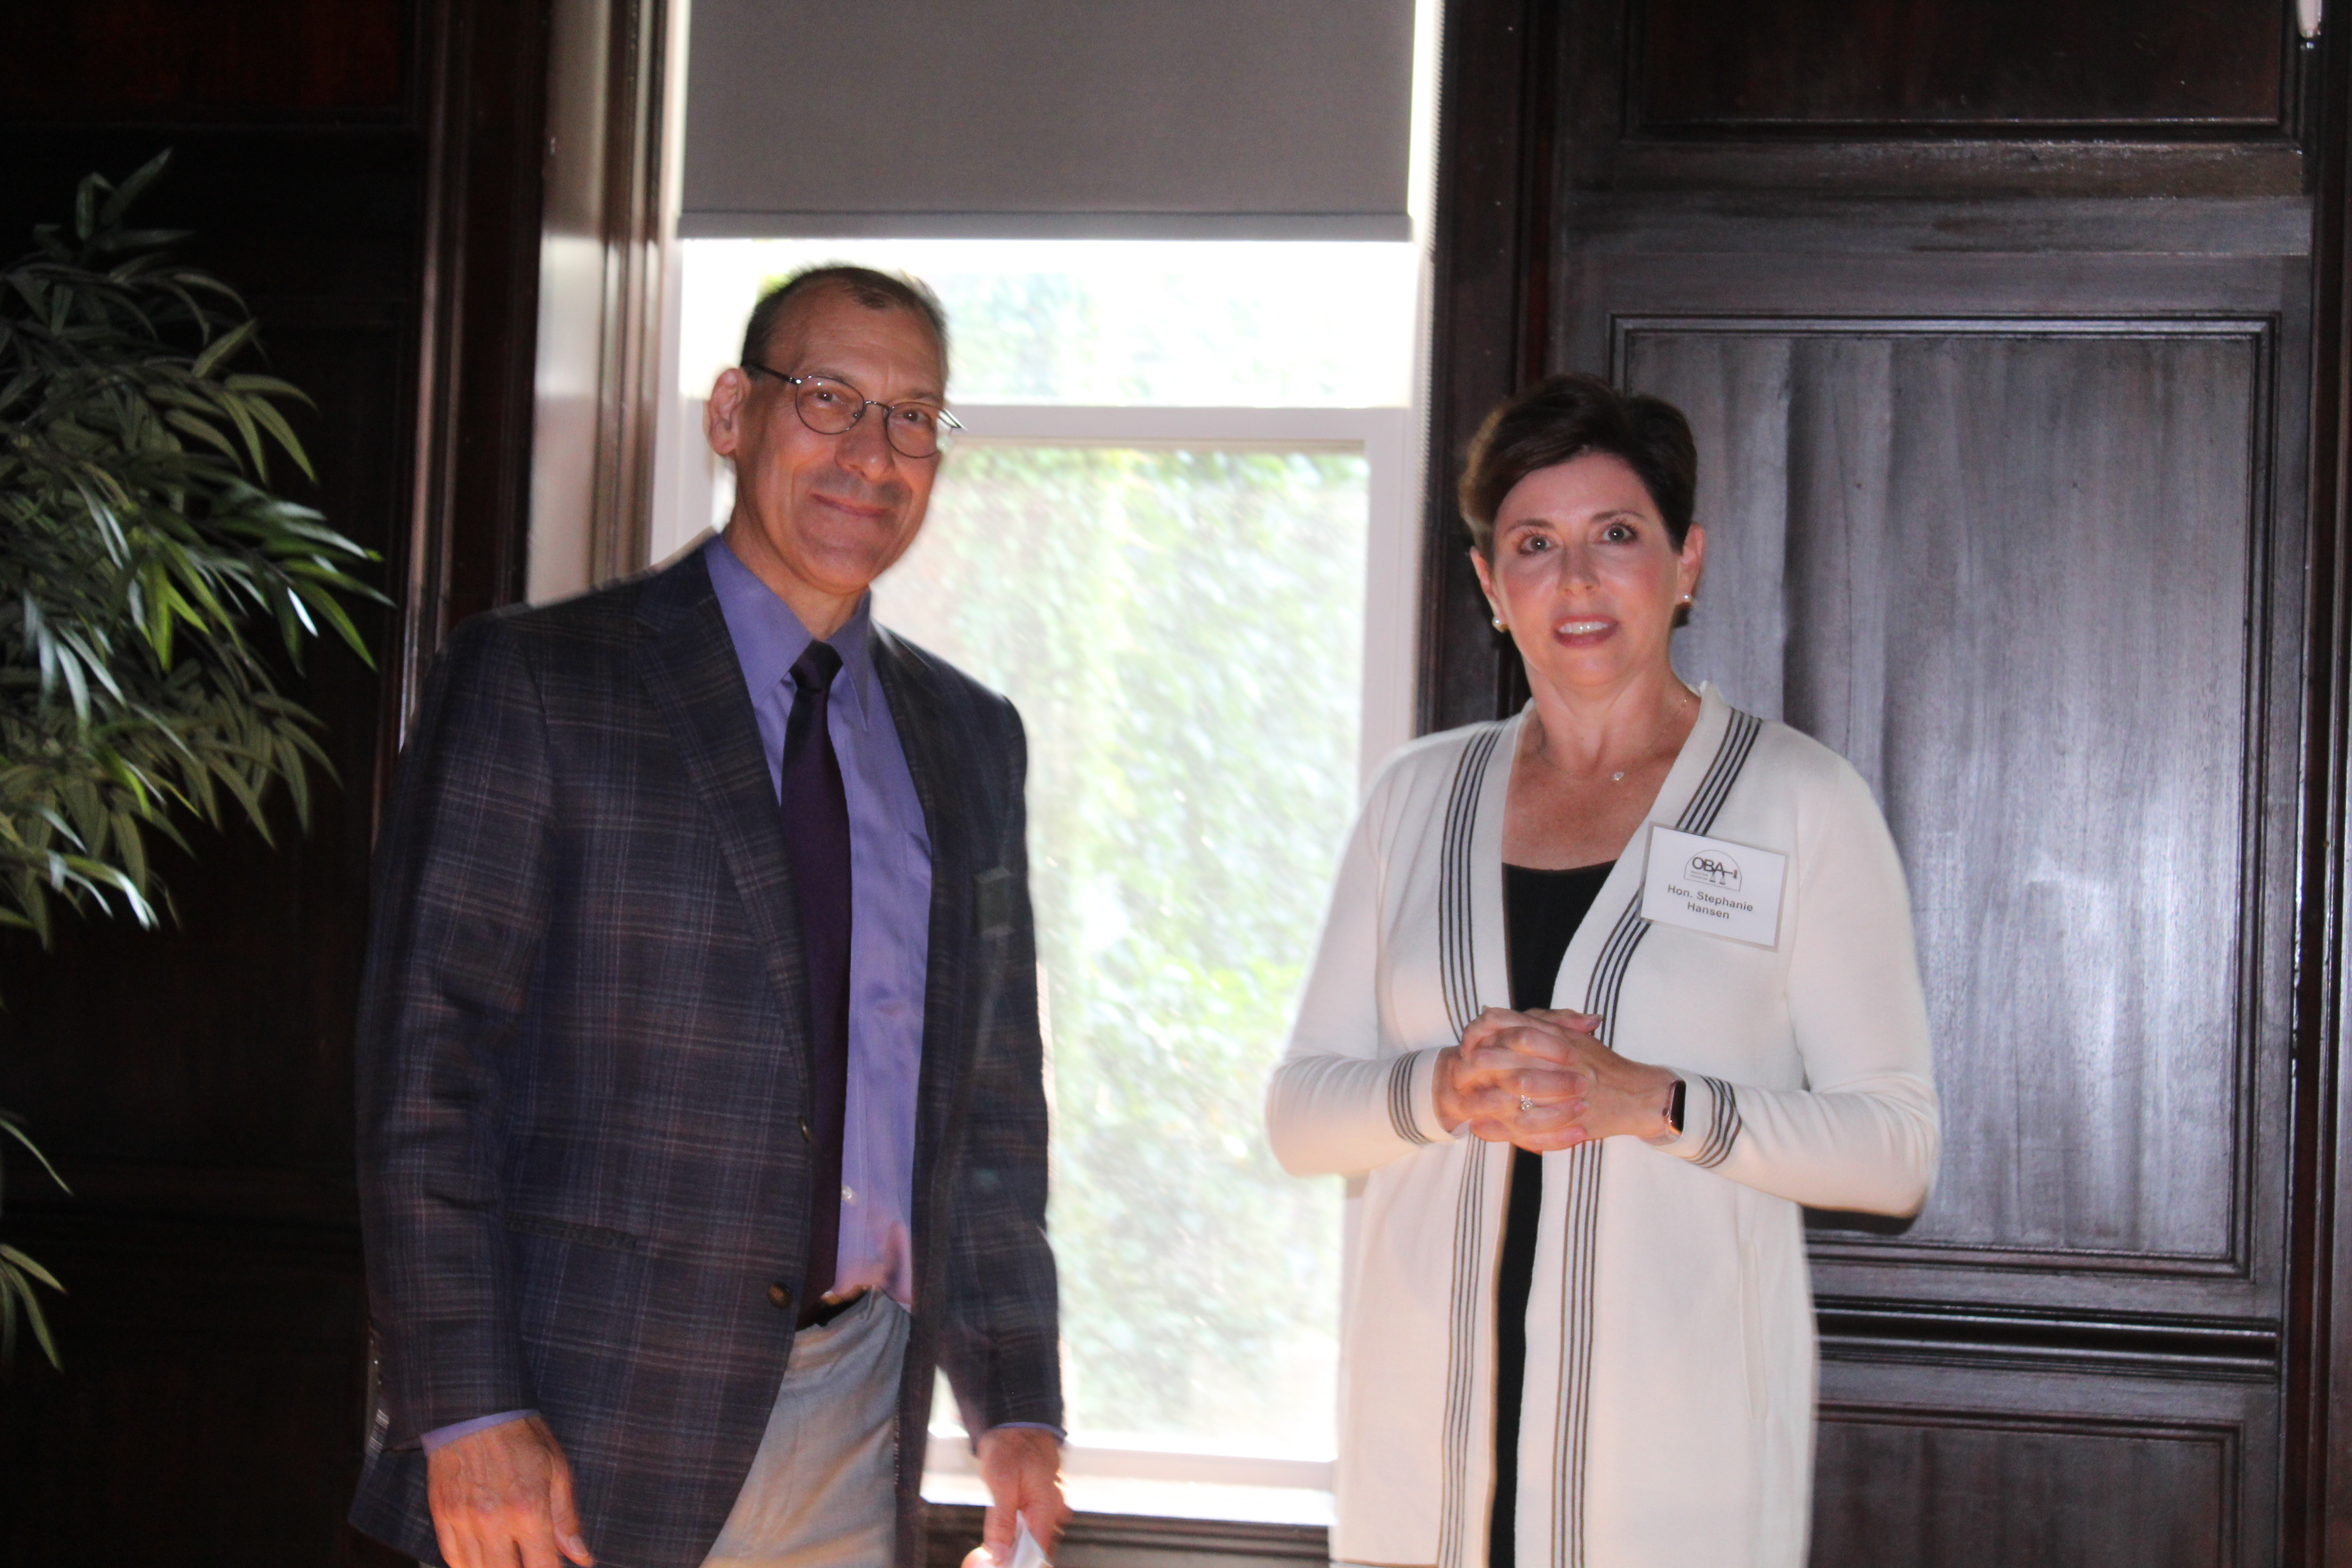 Outgoing OBA President Dave Koukol shares some words of wisdom with new president, Judge Stephanie Hansen, July 21, 2021. (David Golbitz/Daily Record)